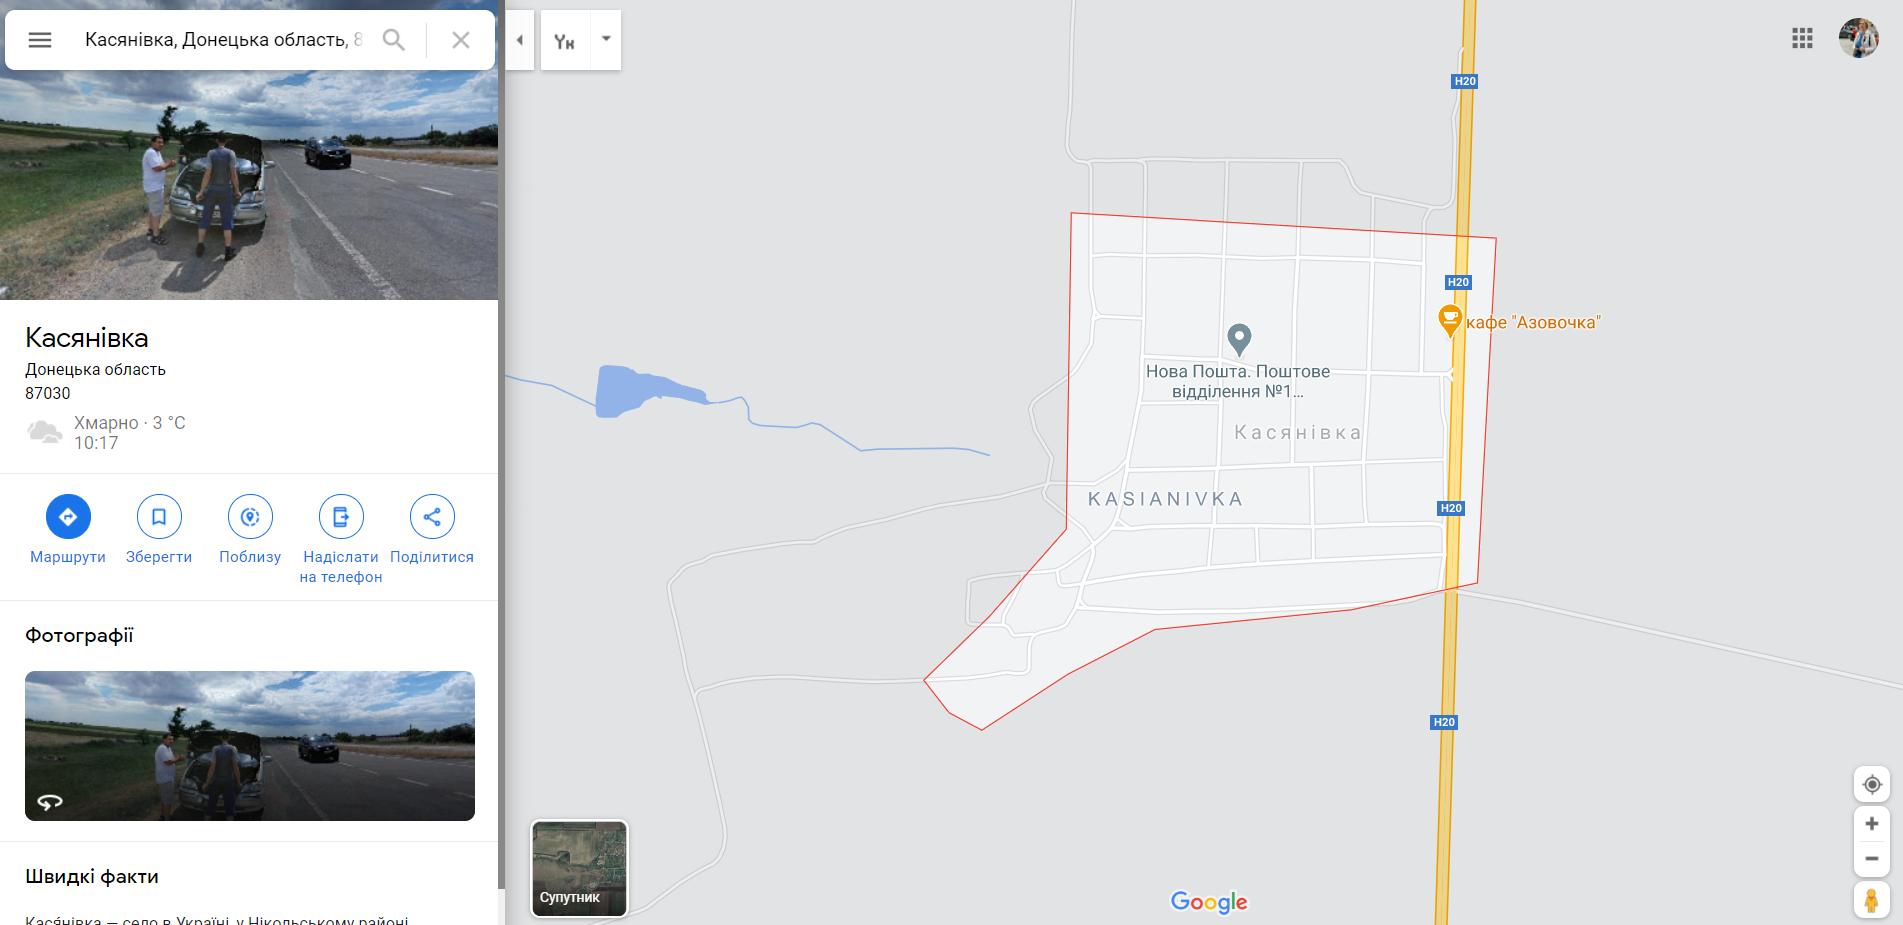 ДТП с фурой произошло возле Касьяновки на Донеччине